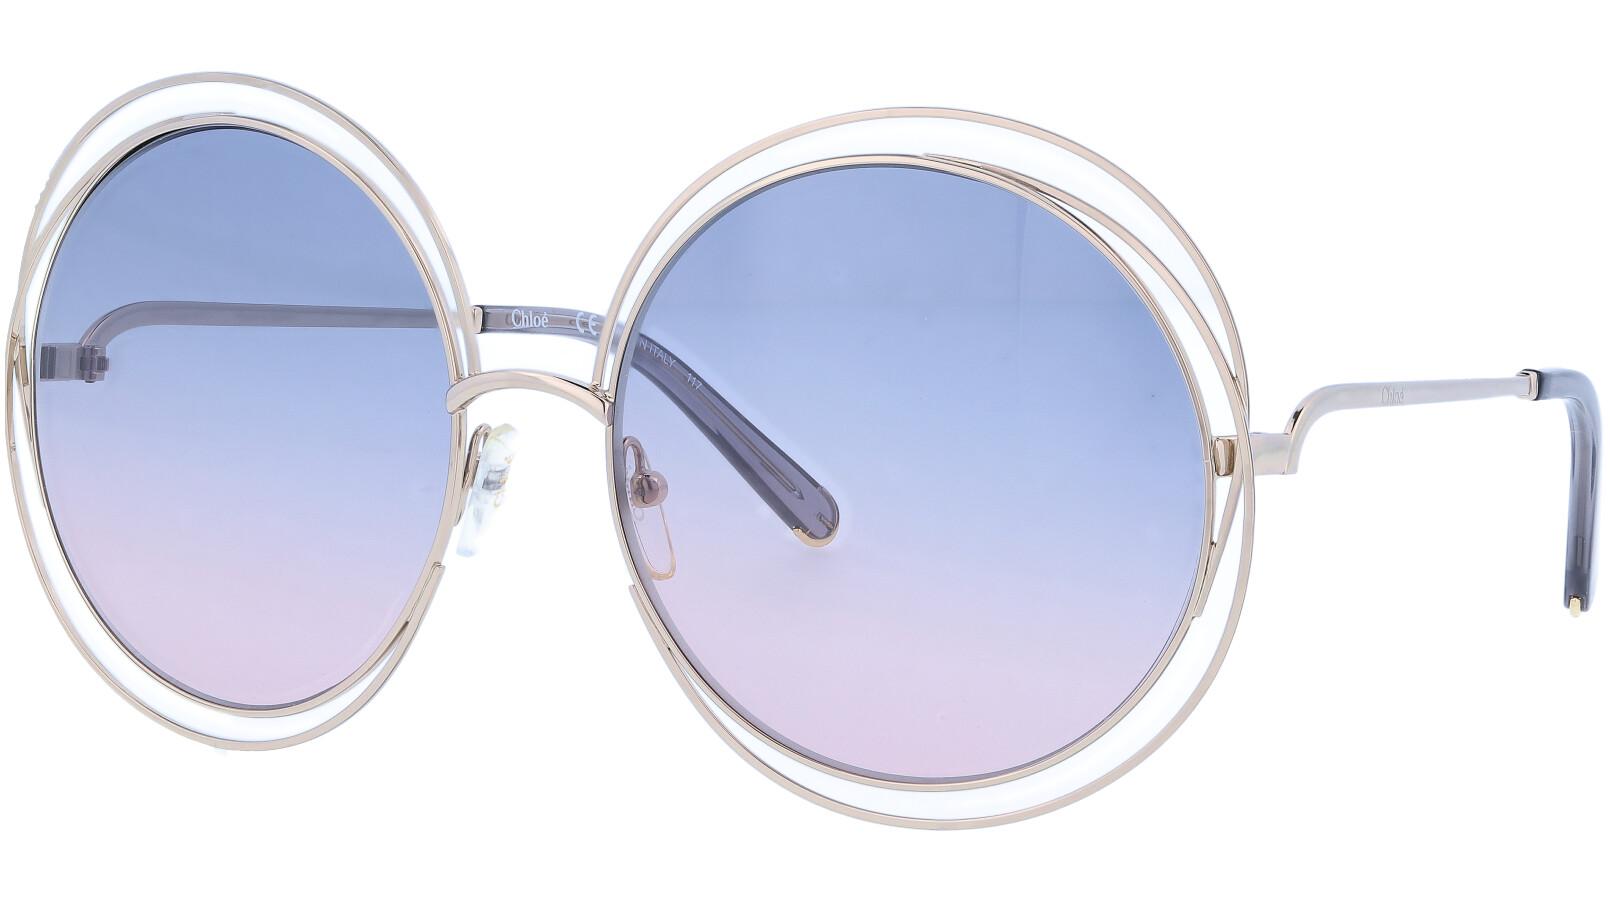 CHLOE CE114S 770 62 Gold Grey Carlina Sunglasses